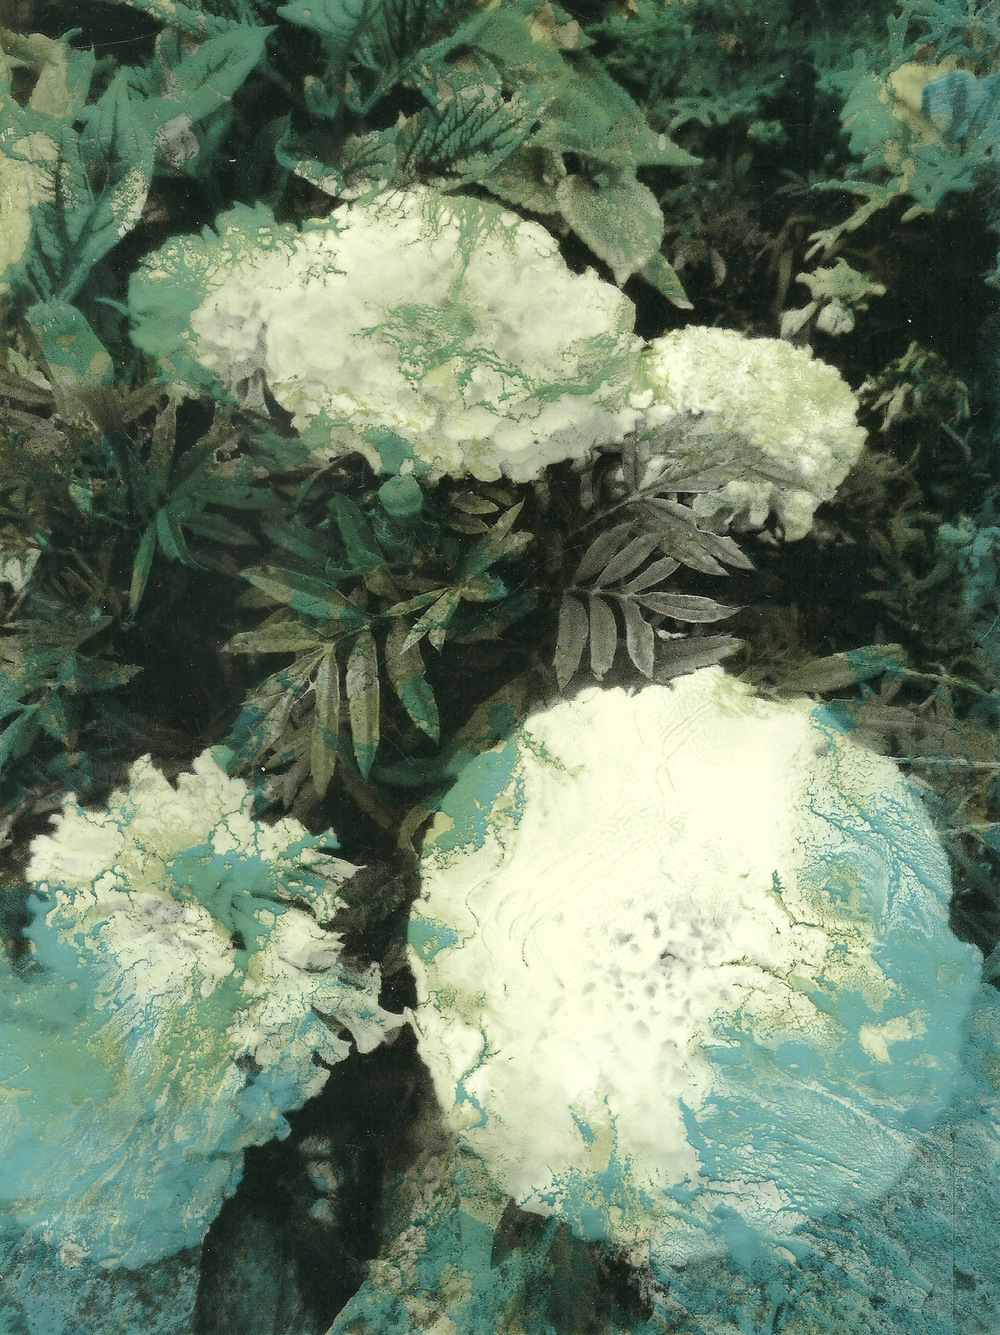 Manami Takamatsu - Sommerfarben, 2017, Mixed Media, 297x210mm